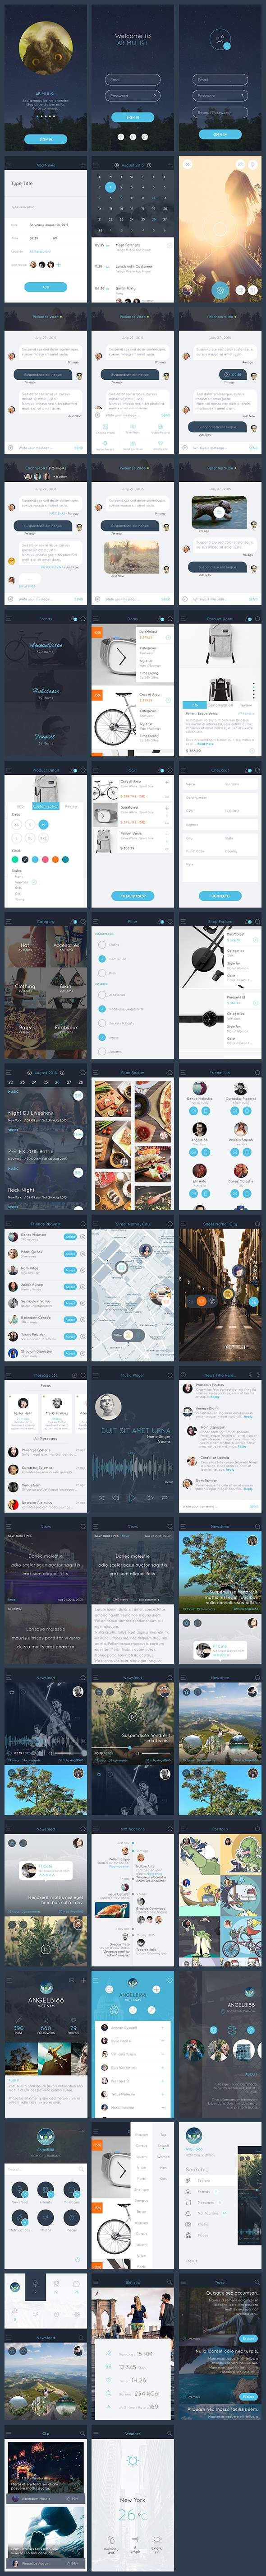 app, app design, bundle, ios 8, ios 9, iphone 6, minimalist, mobile, quality, ui, ui design, ui kit, ux